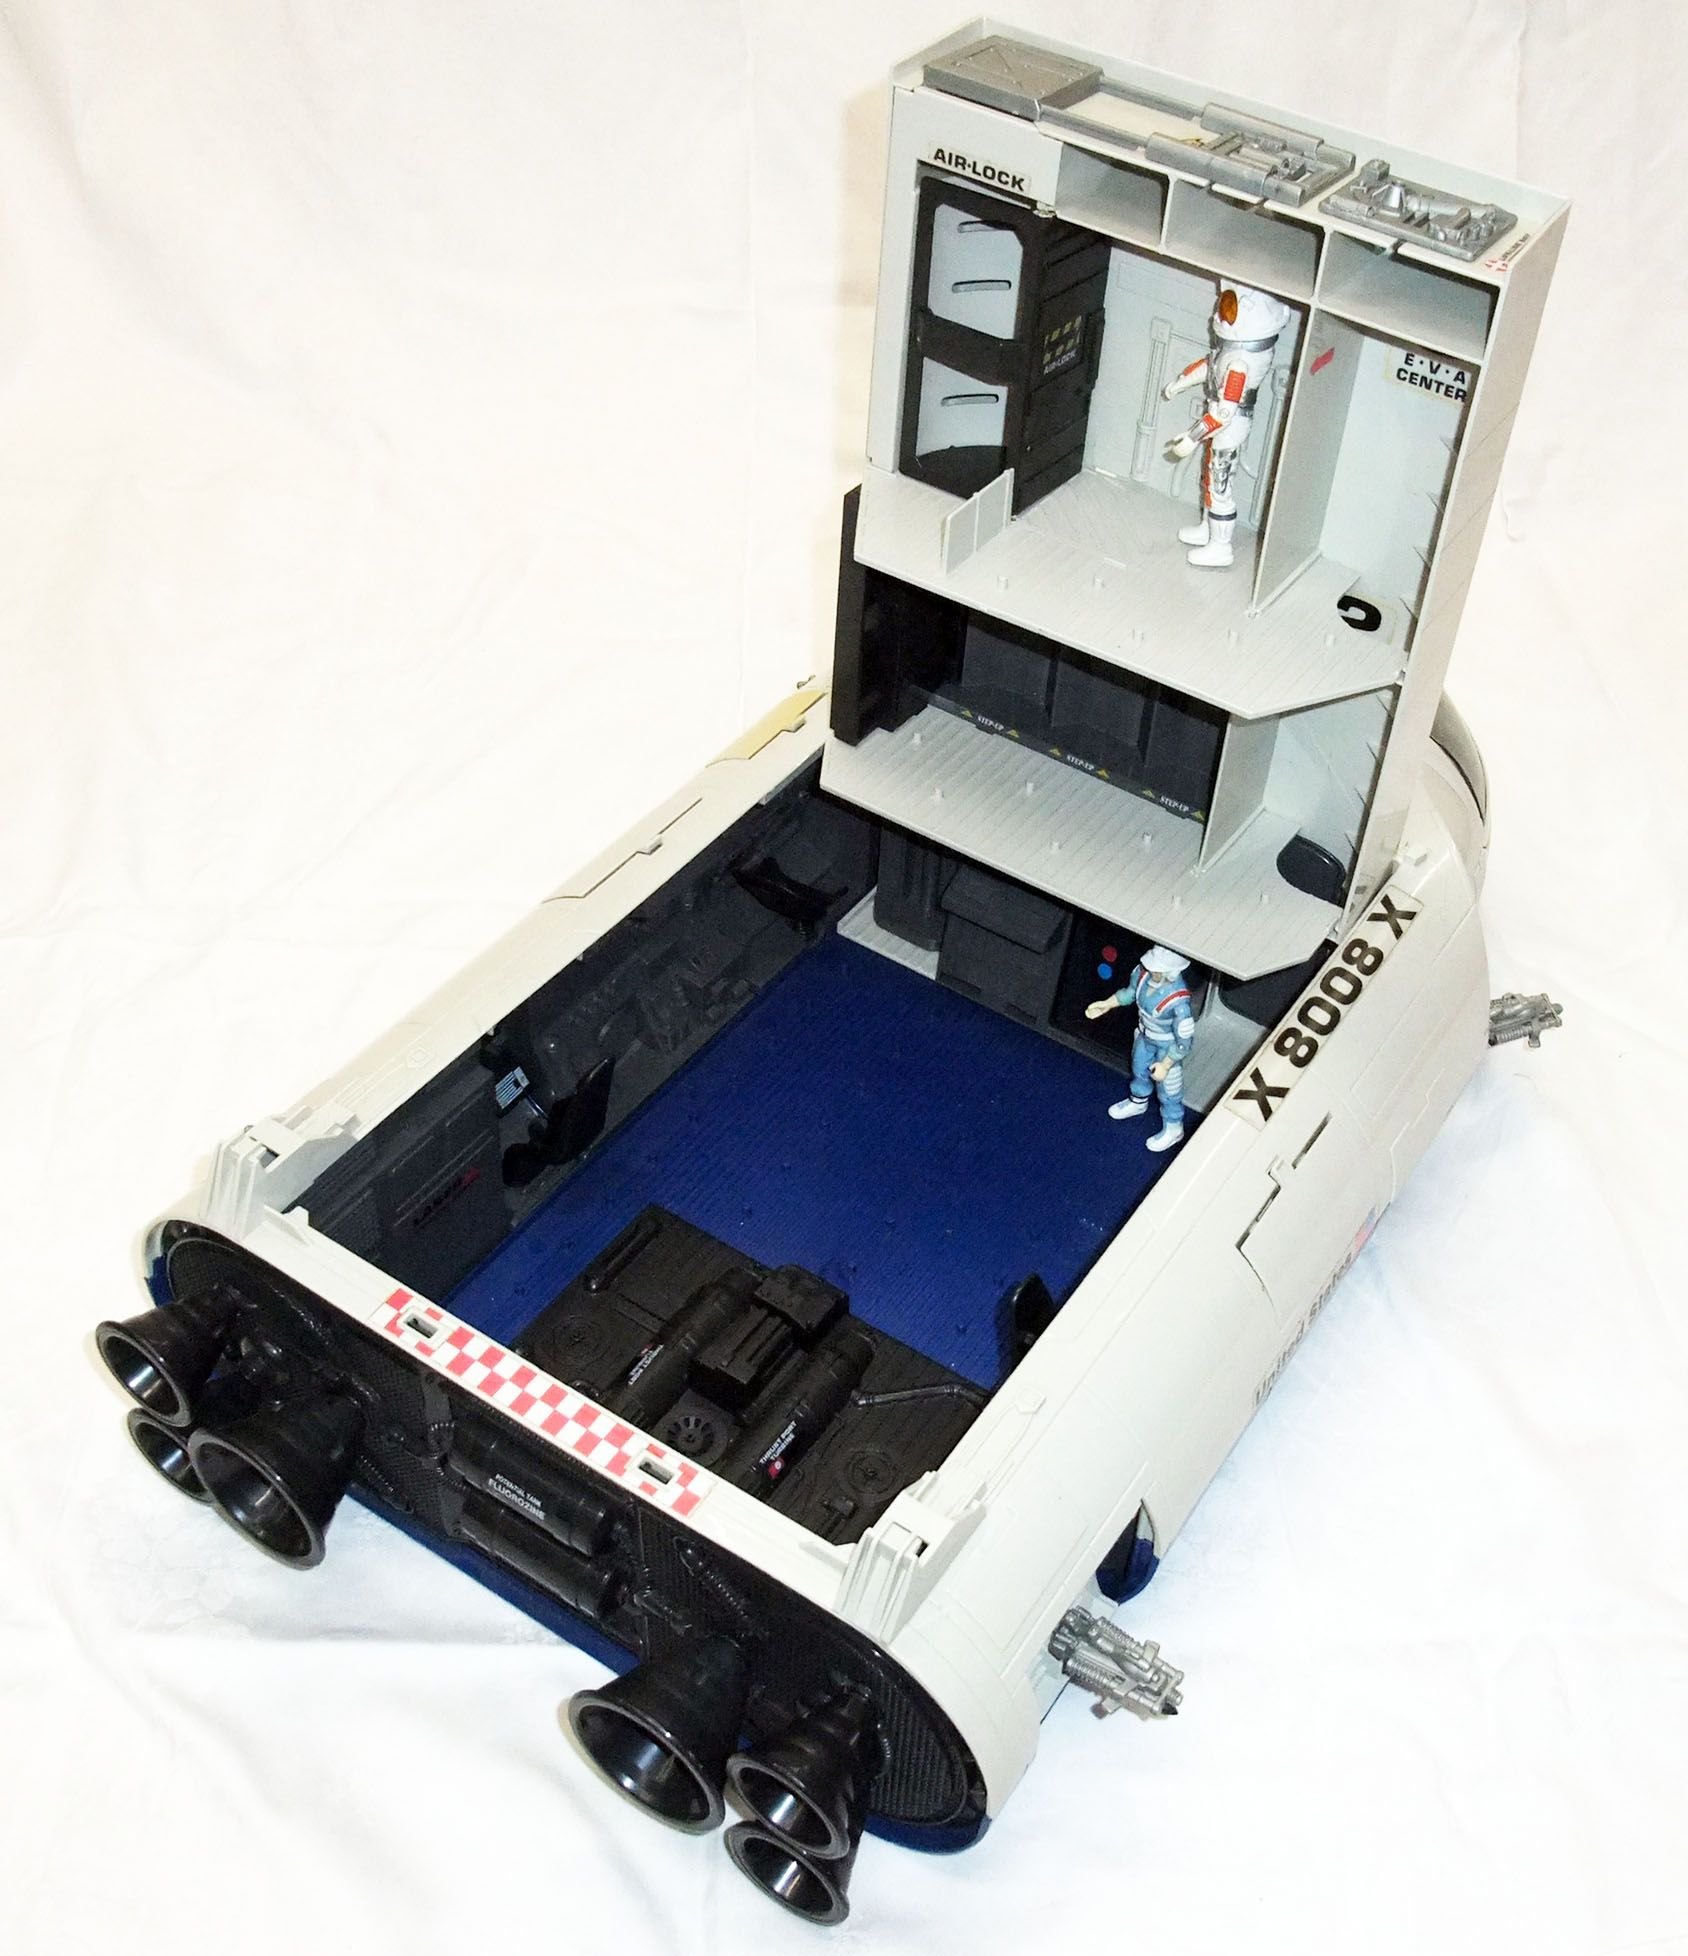 G.I.JOE - 1987 - Defiant Space Vehicle Launch Complex avec Payload & Hardtop (loose)